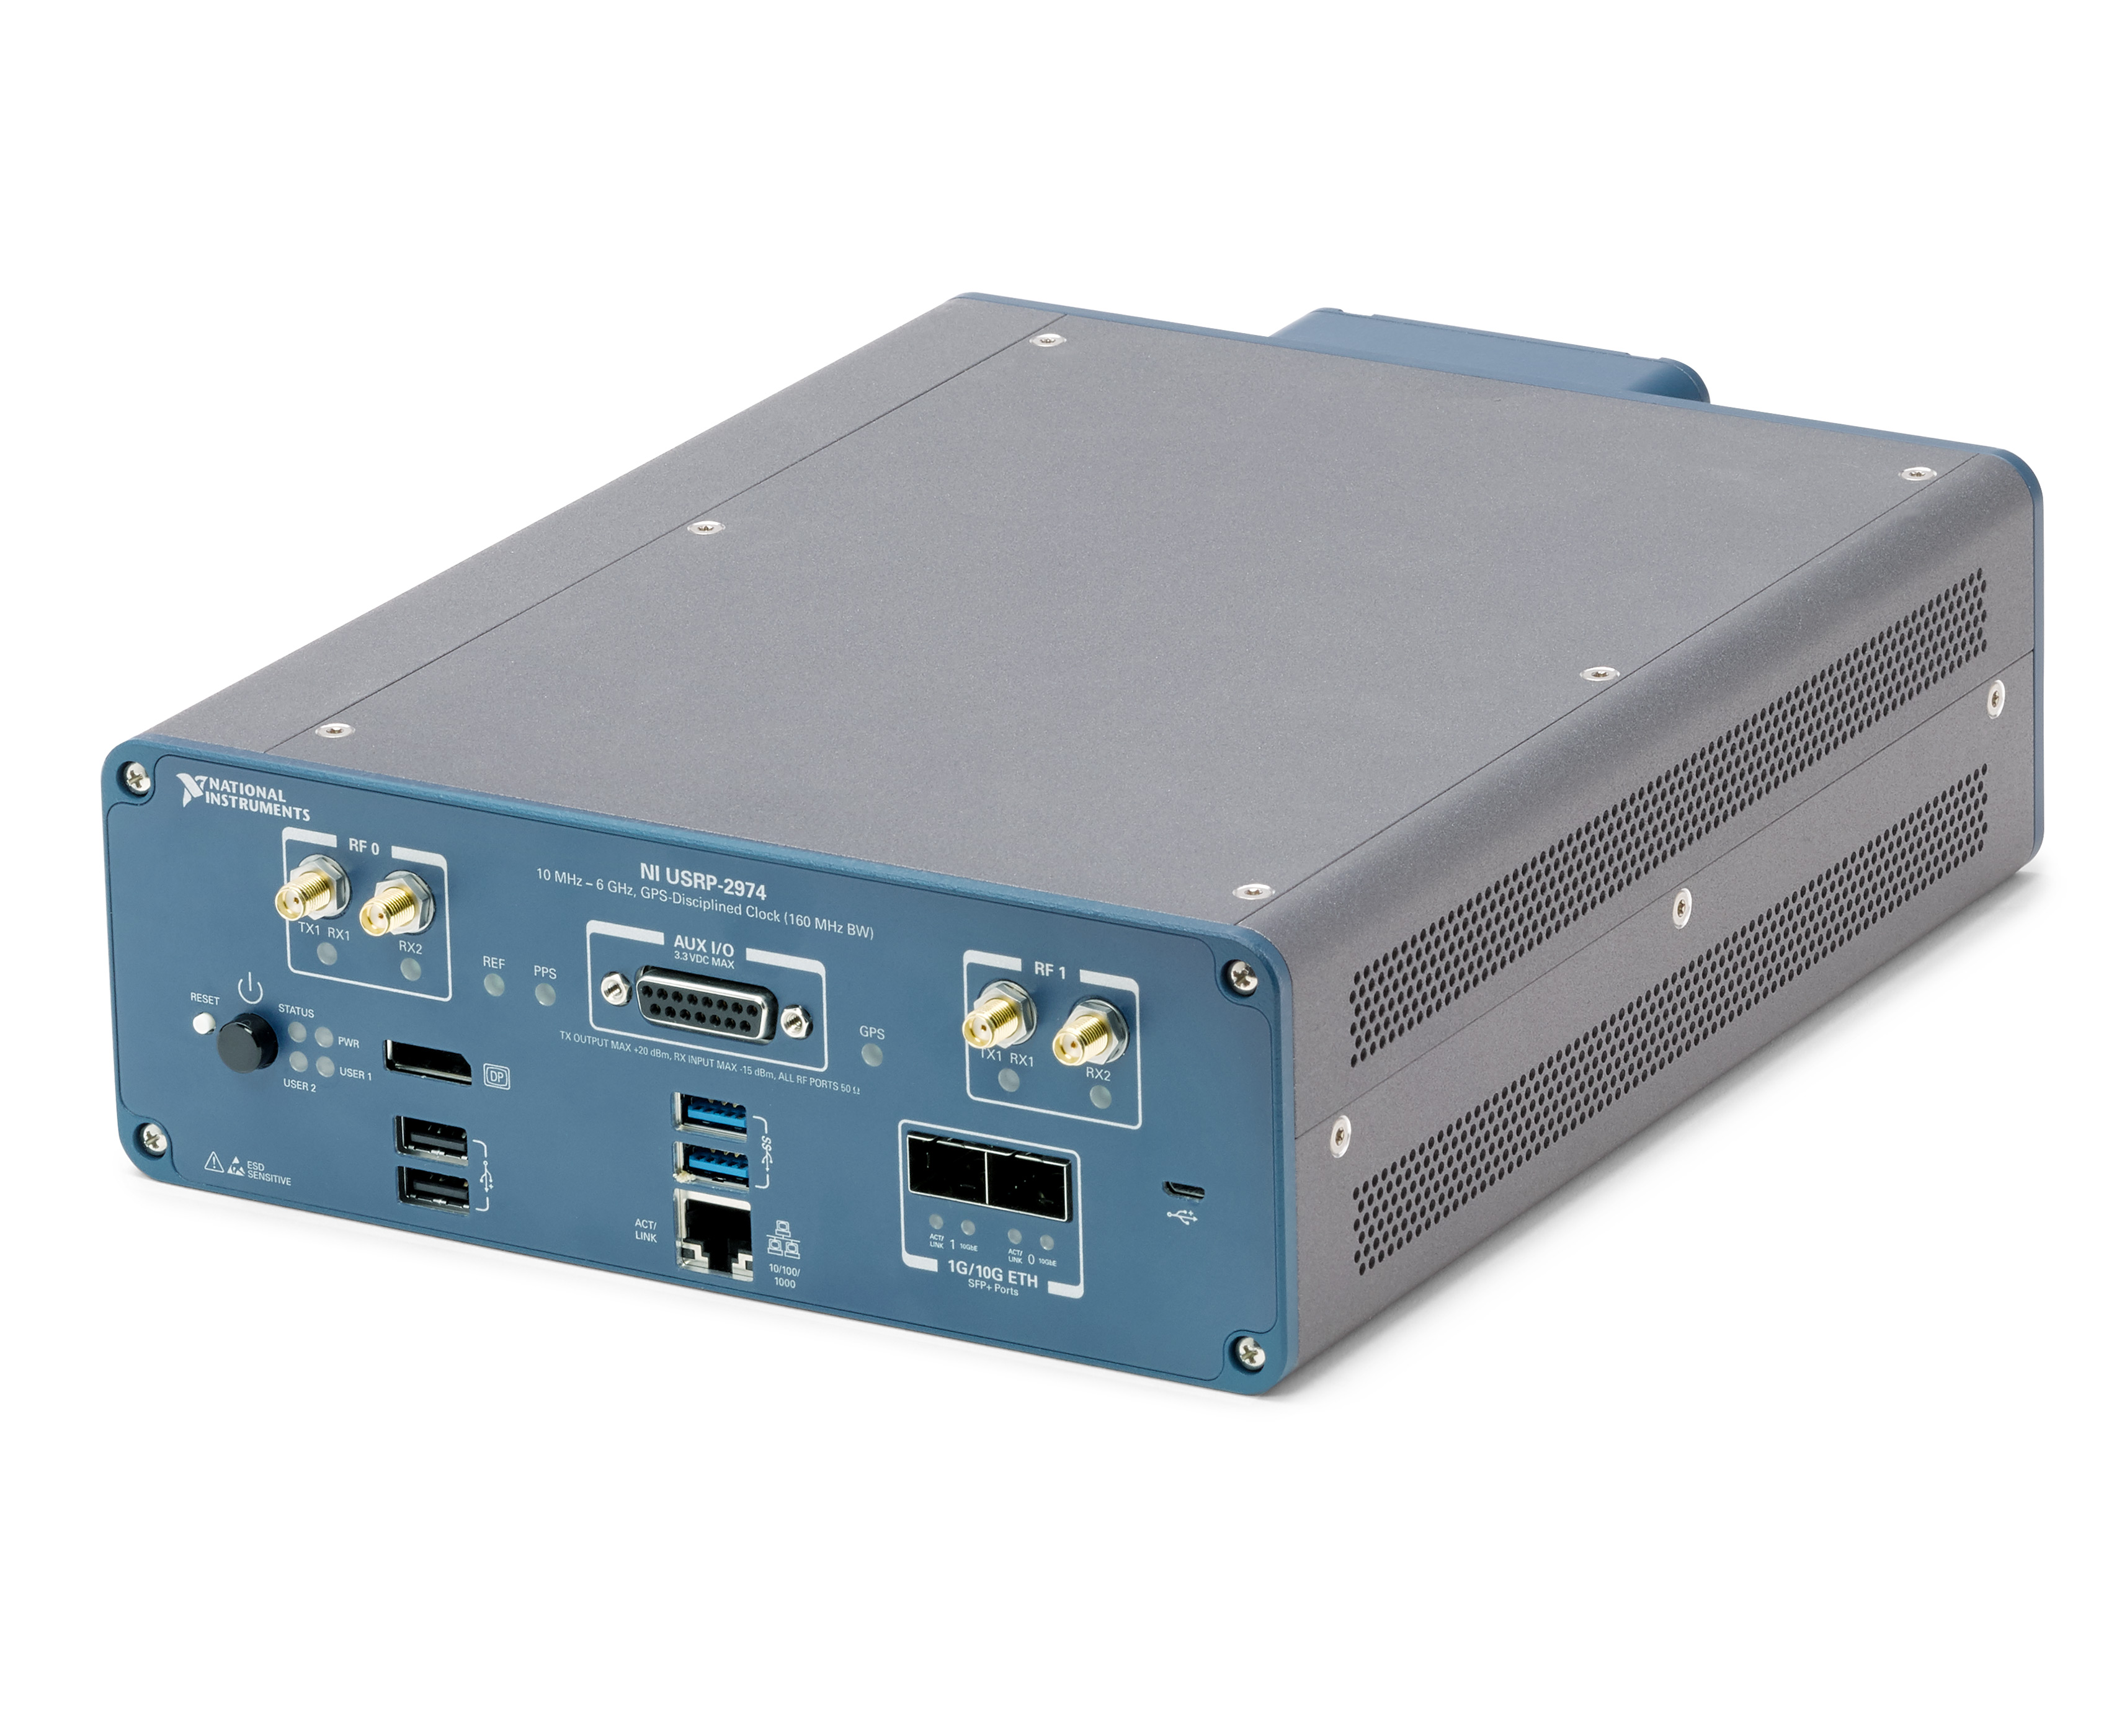 USRP-2974